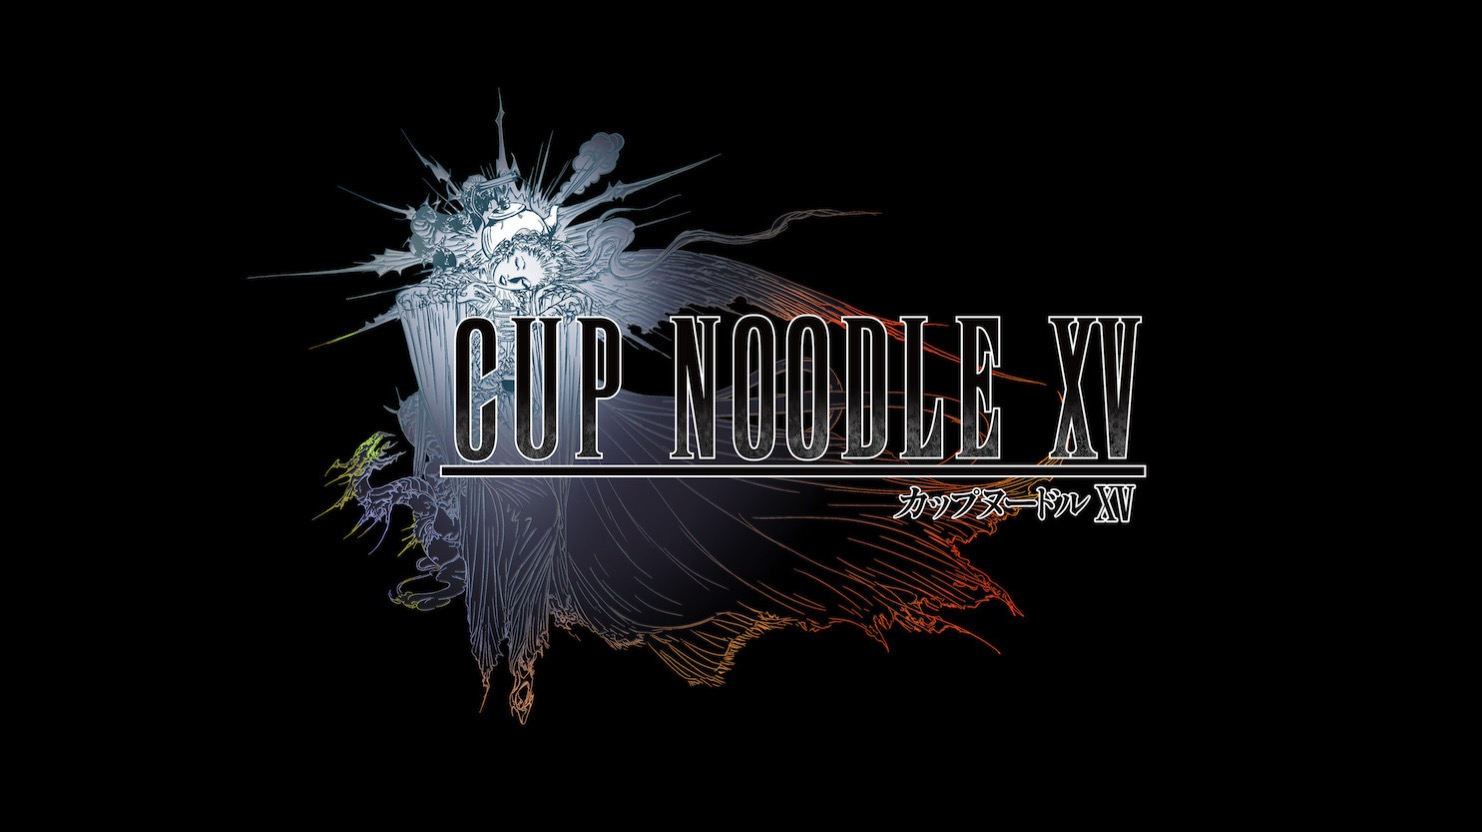 Cup noodle xv 1